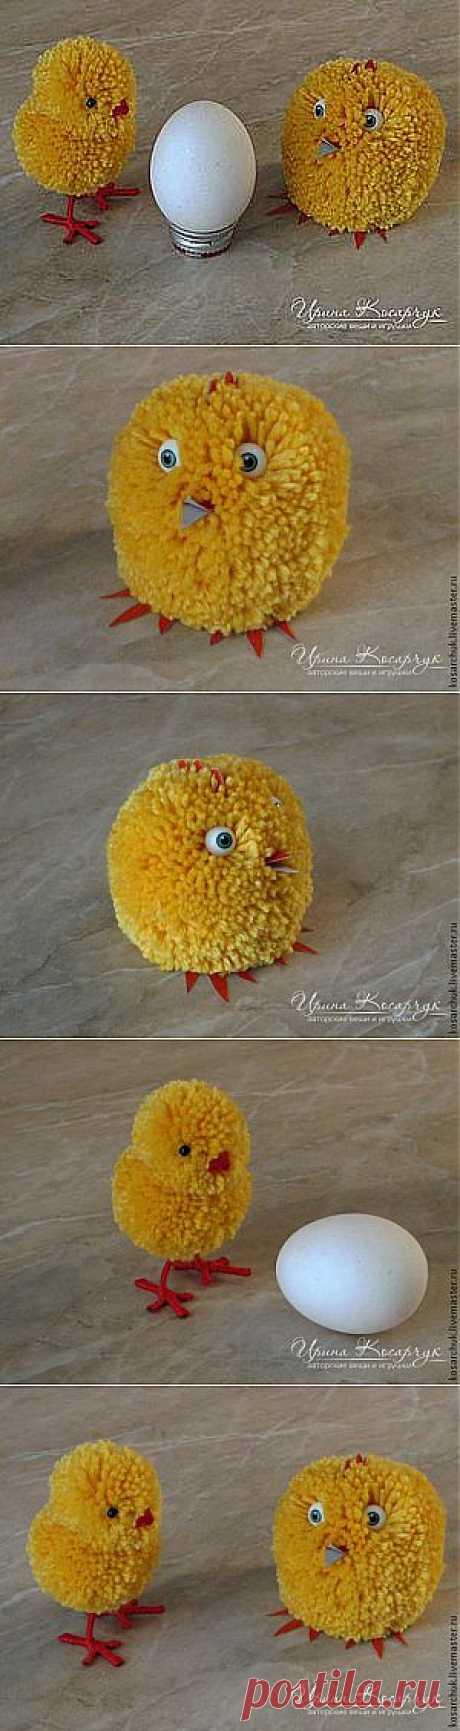 "Master class: ""Пасхальные chickens from помпонов"" - A fair of Masters - handwork, handmade"